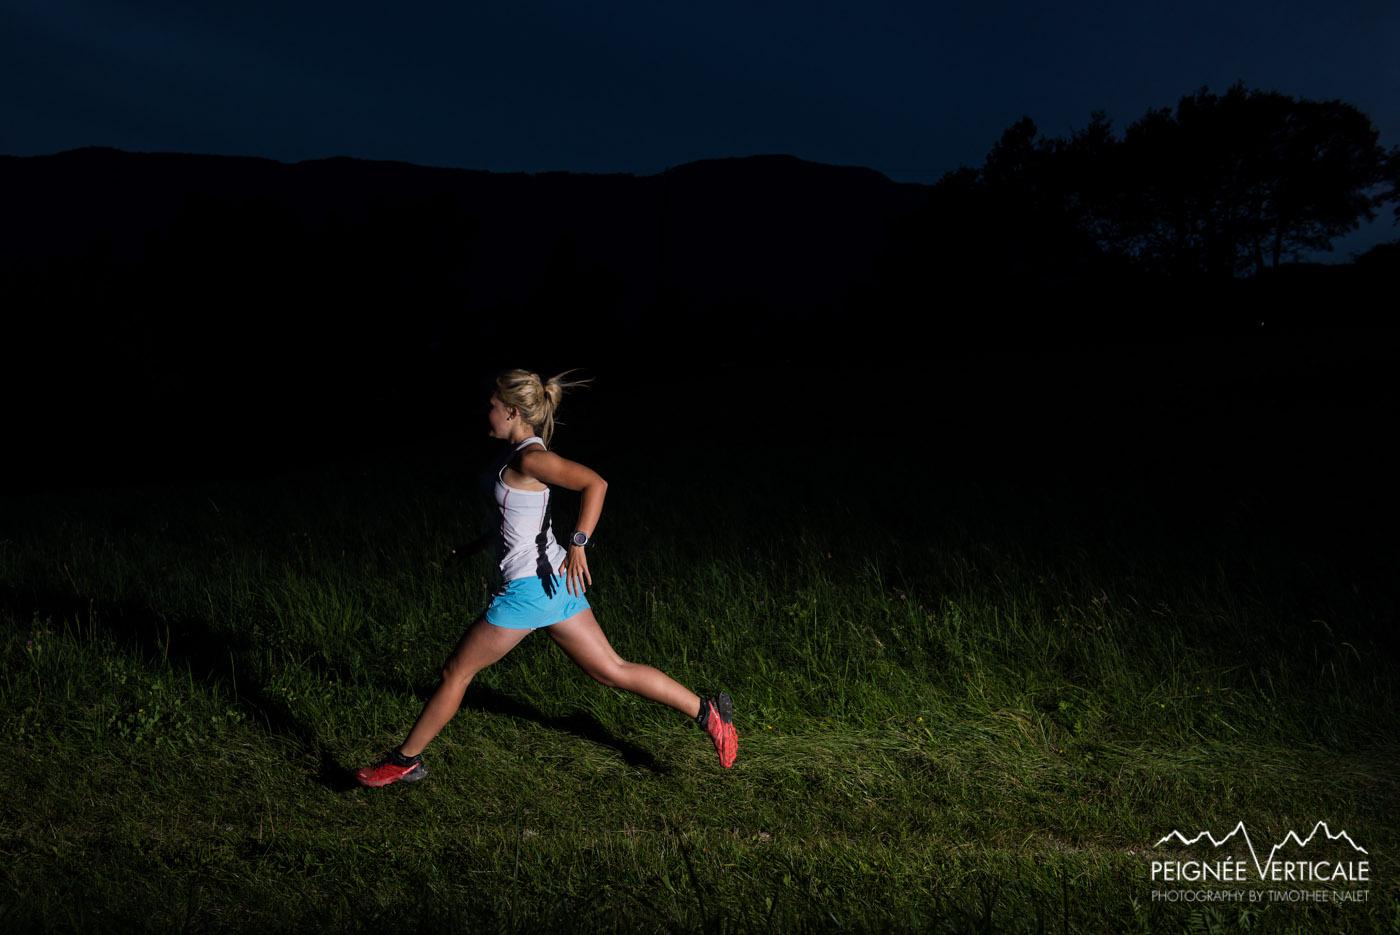 Timothee-Nalet-Laurie-Renoton-Running-night-5647.jpg